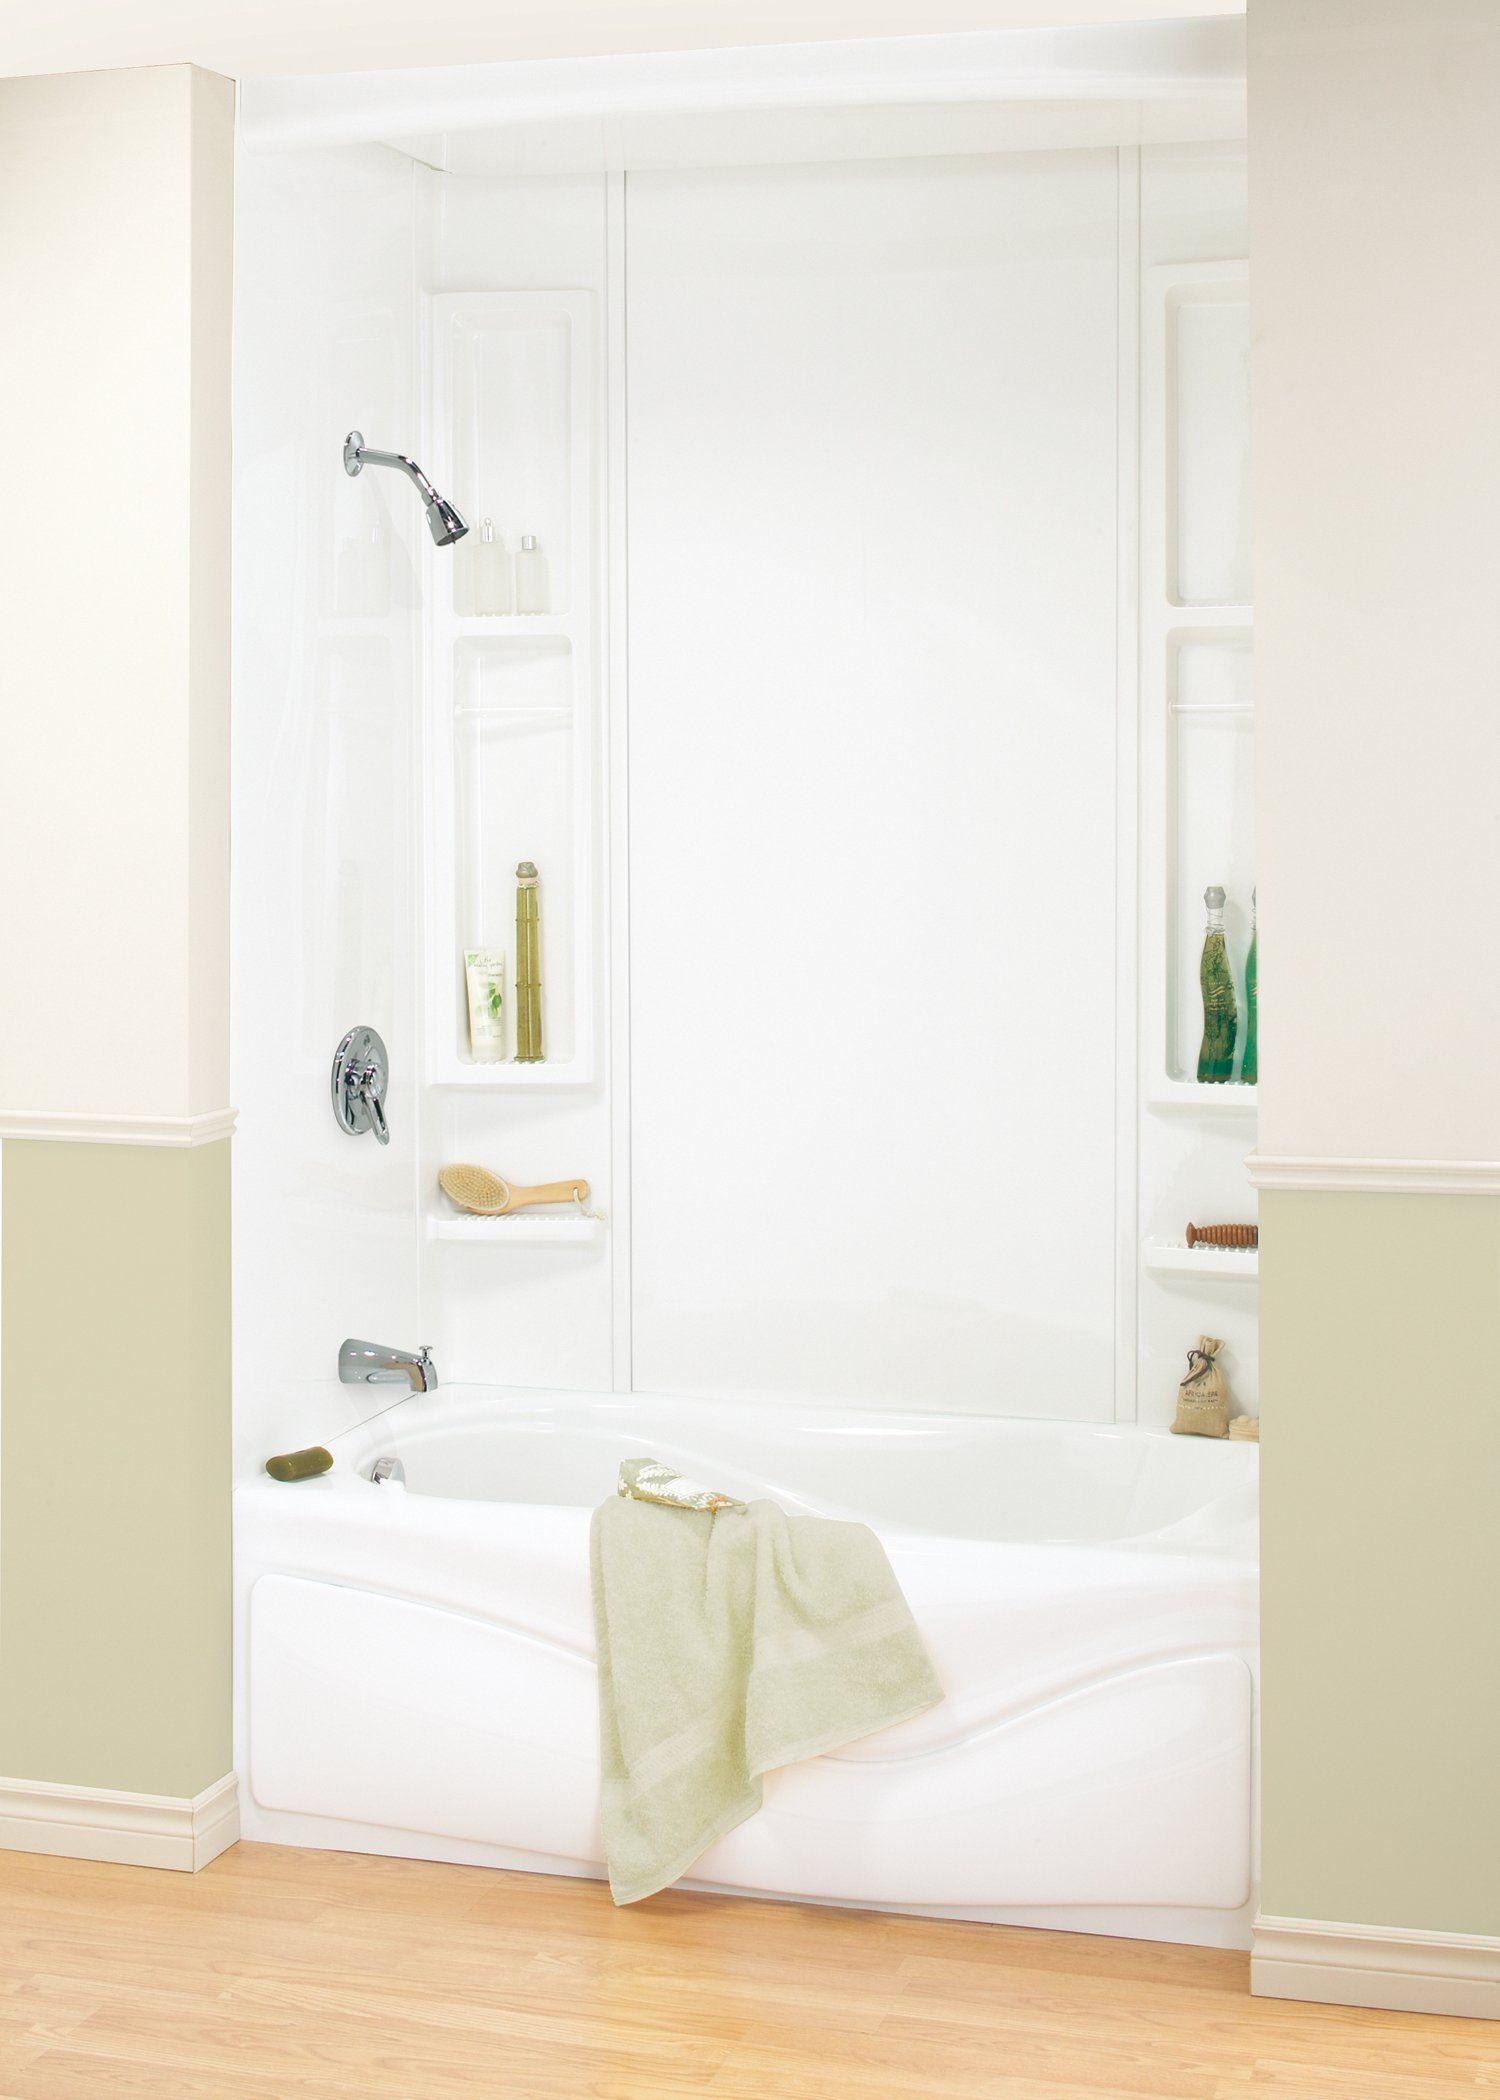 Maax 101595-000-129 5-Piece Bathtub Wall Kit, White | Bathtub walls ...